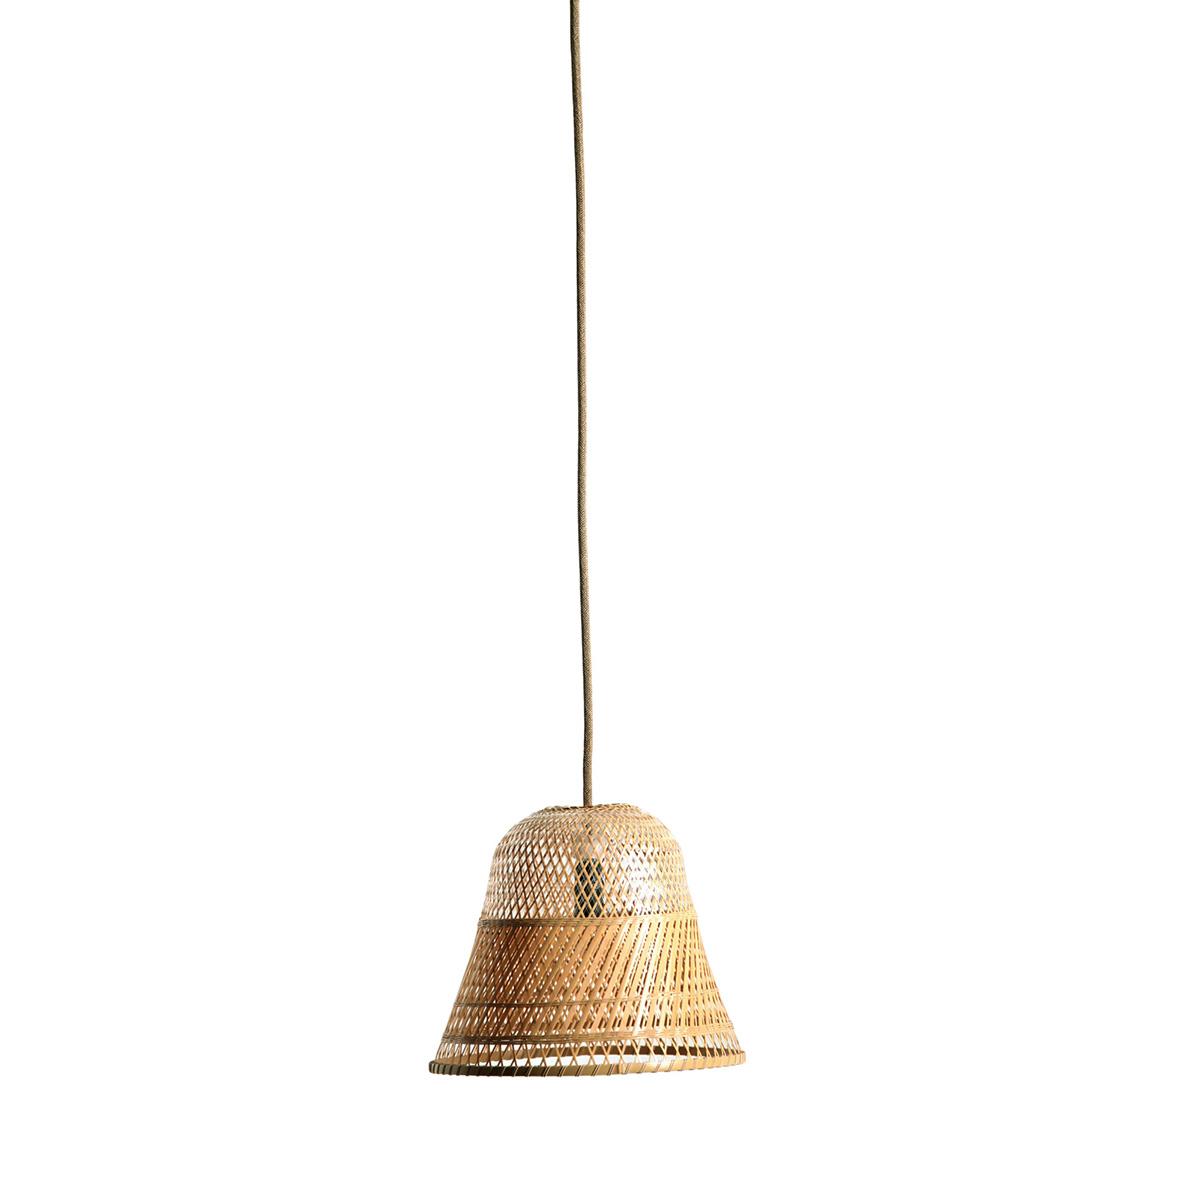 11-pet-lamp-kyoto-chiemi-ogura-alvaro-catalan-ocon